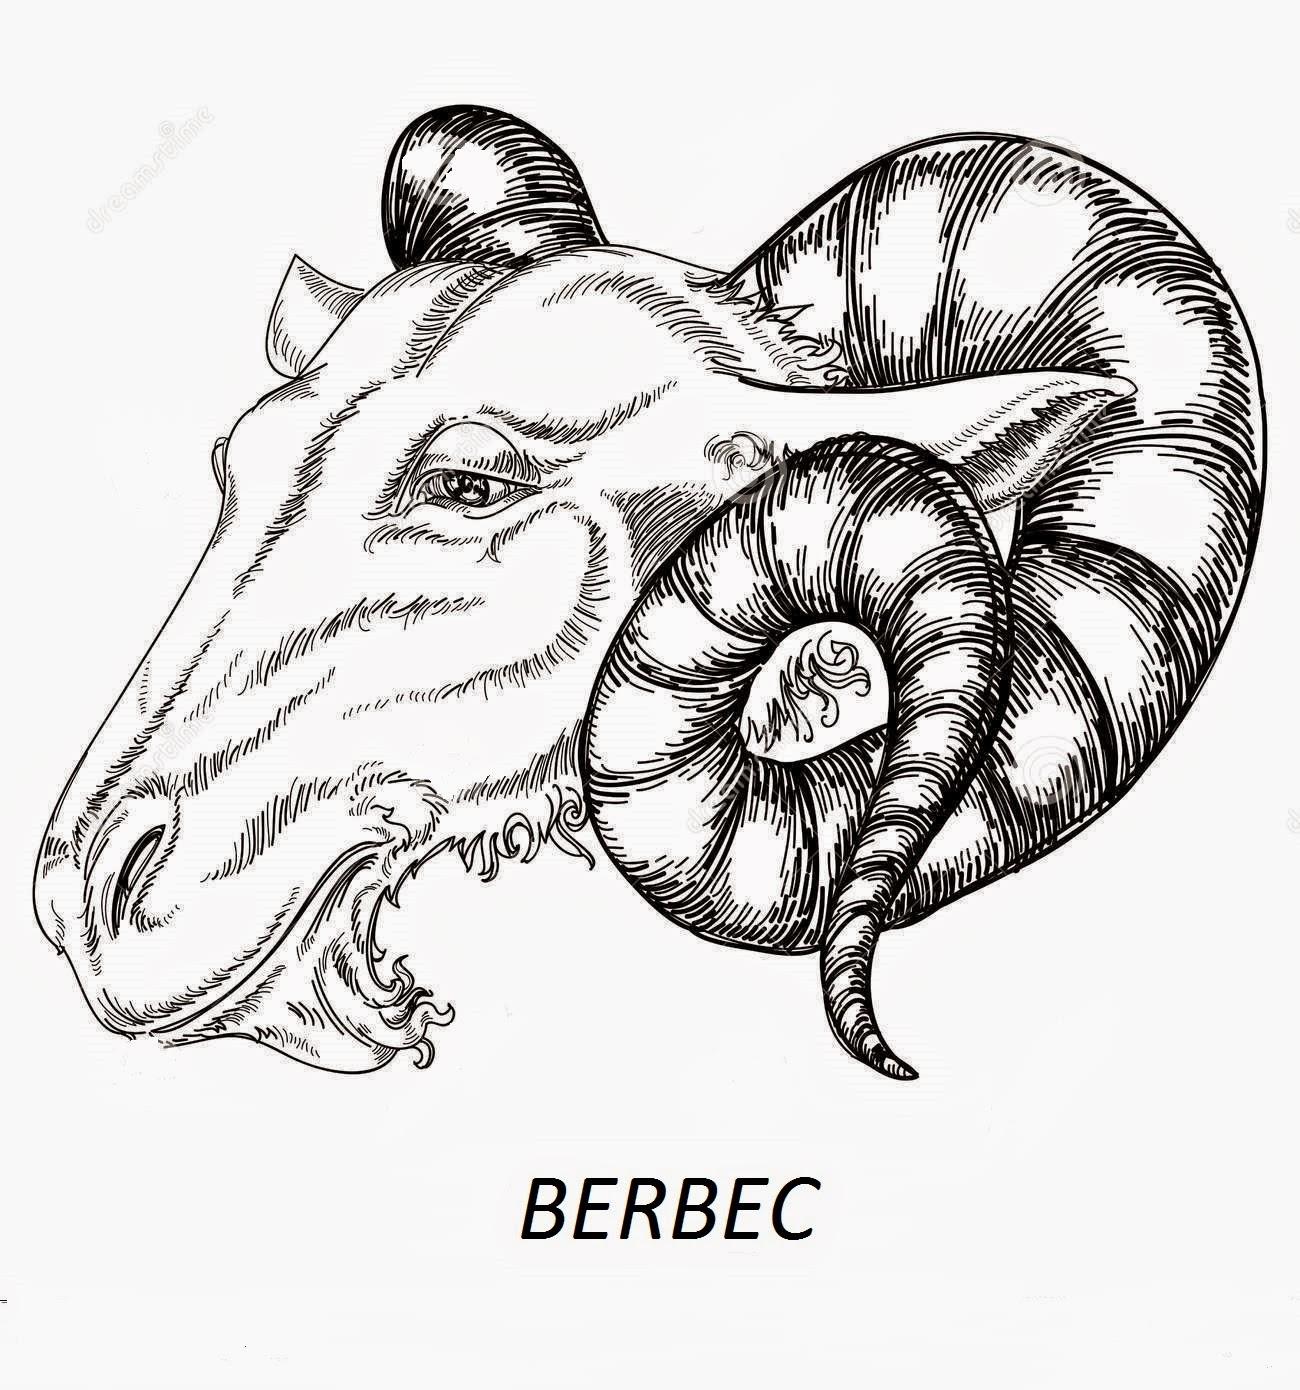 Horoscop septembrie 2014 - Berbec